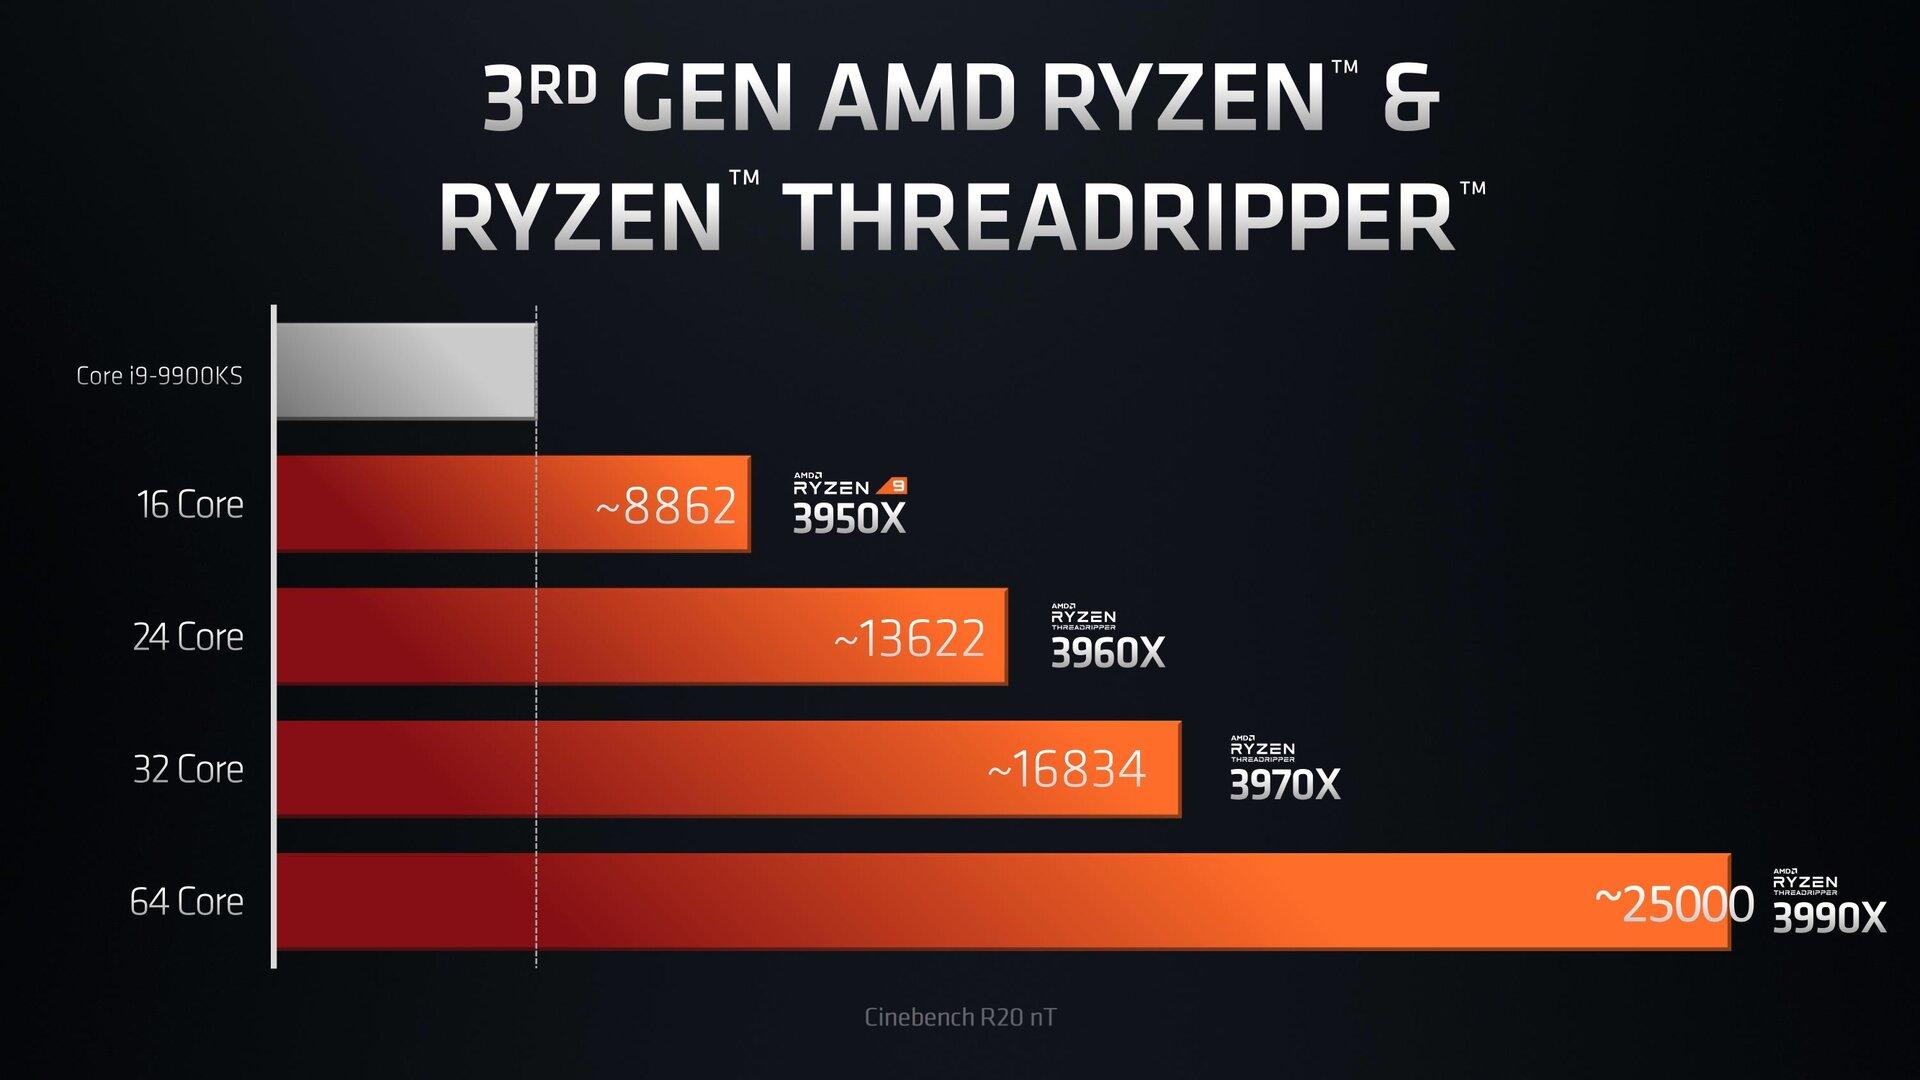 Amd Ryzen Threadripper 3990x Available February 7th For 3990 Usd Videocardz Com